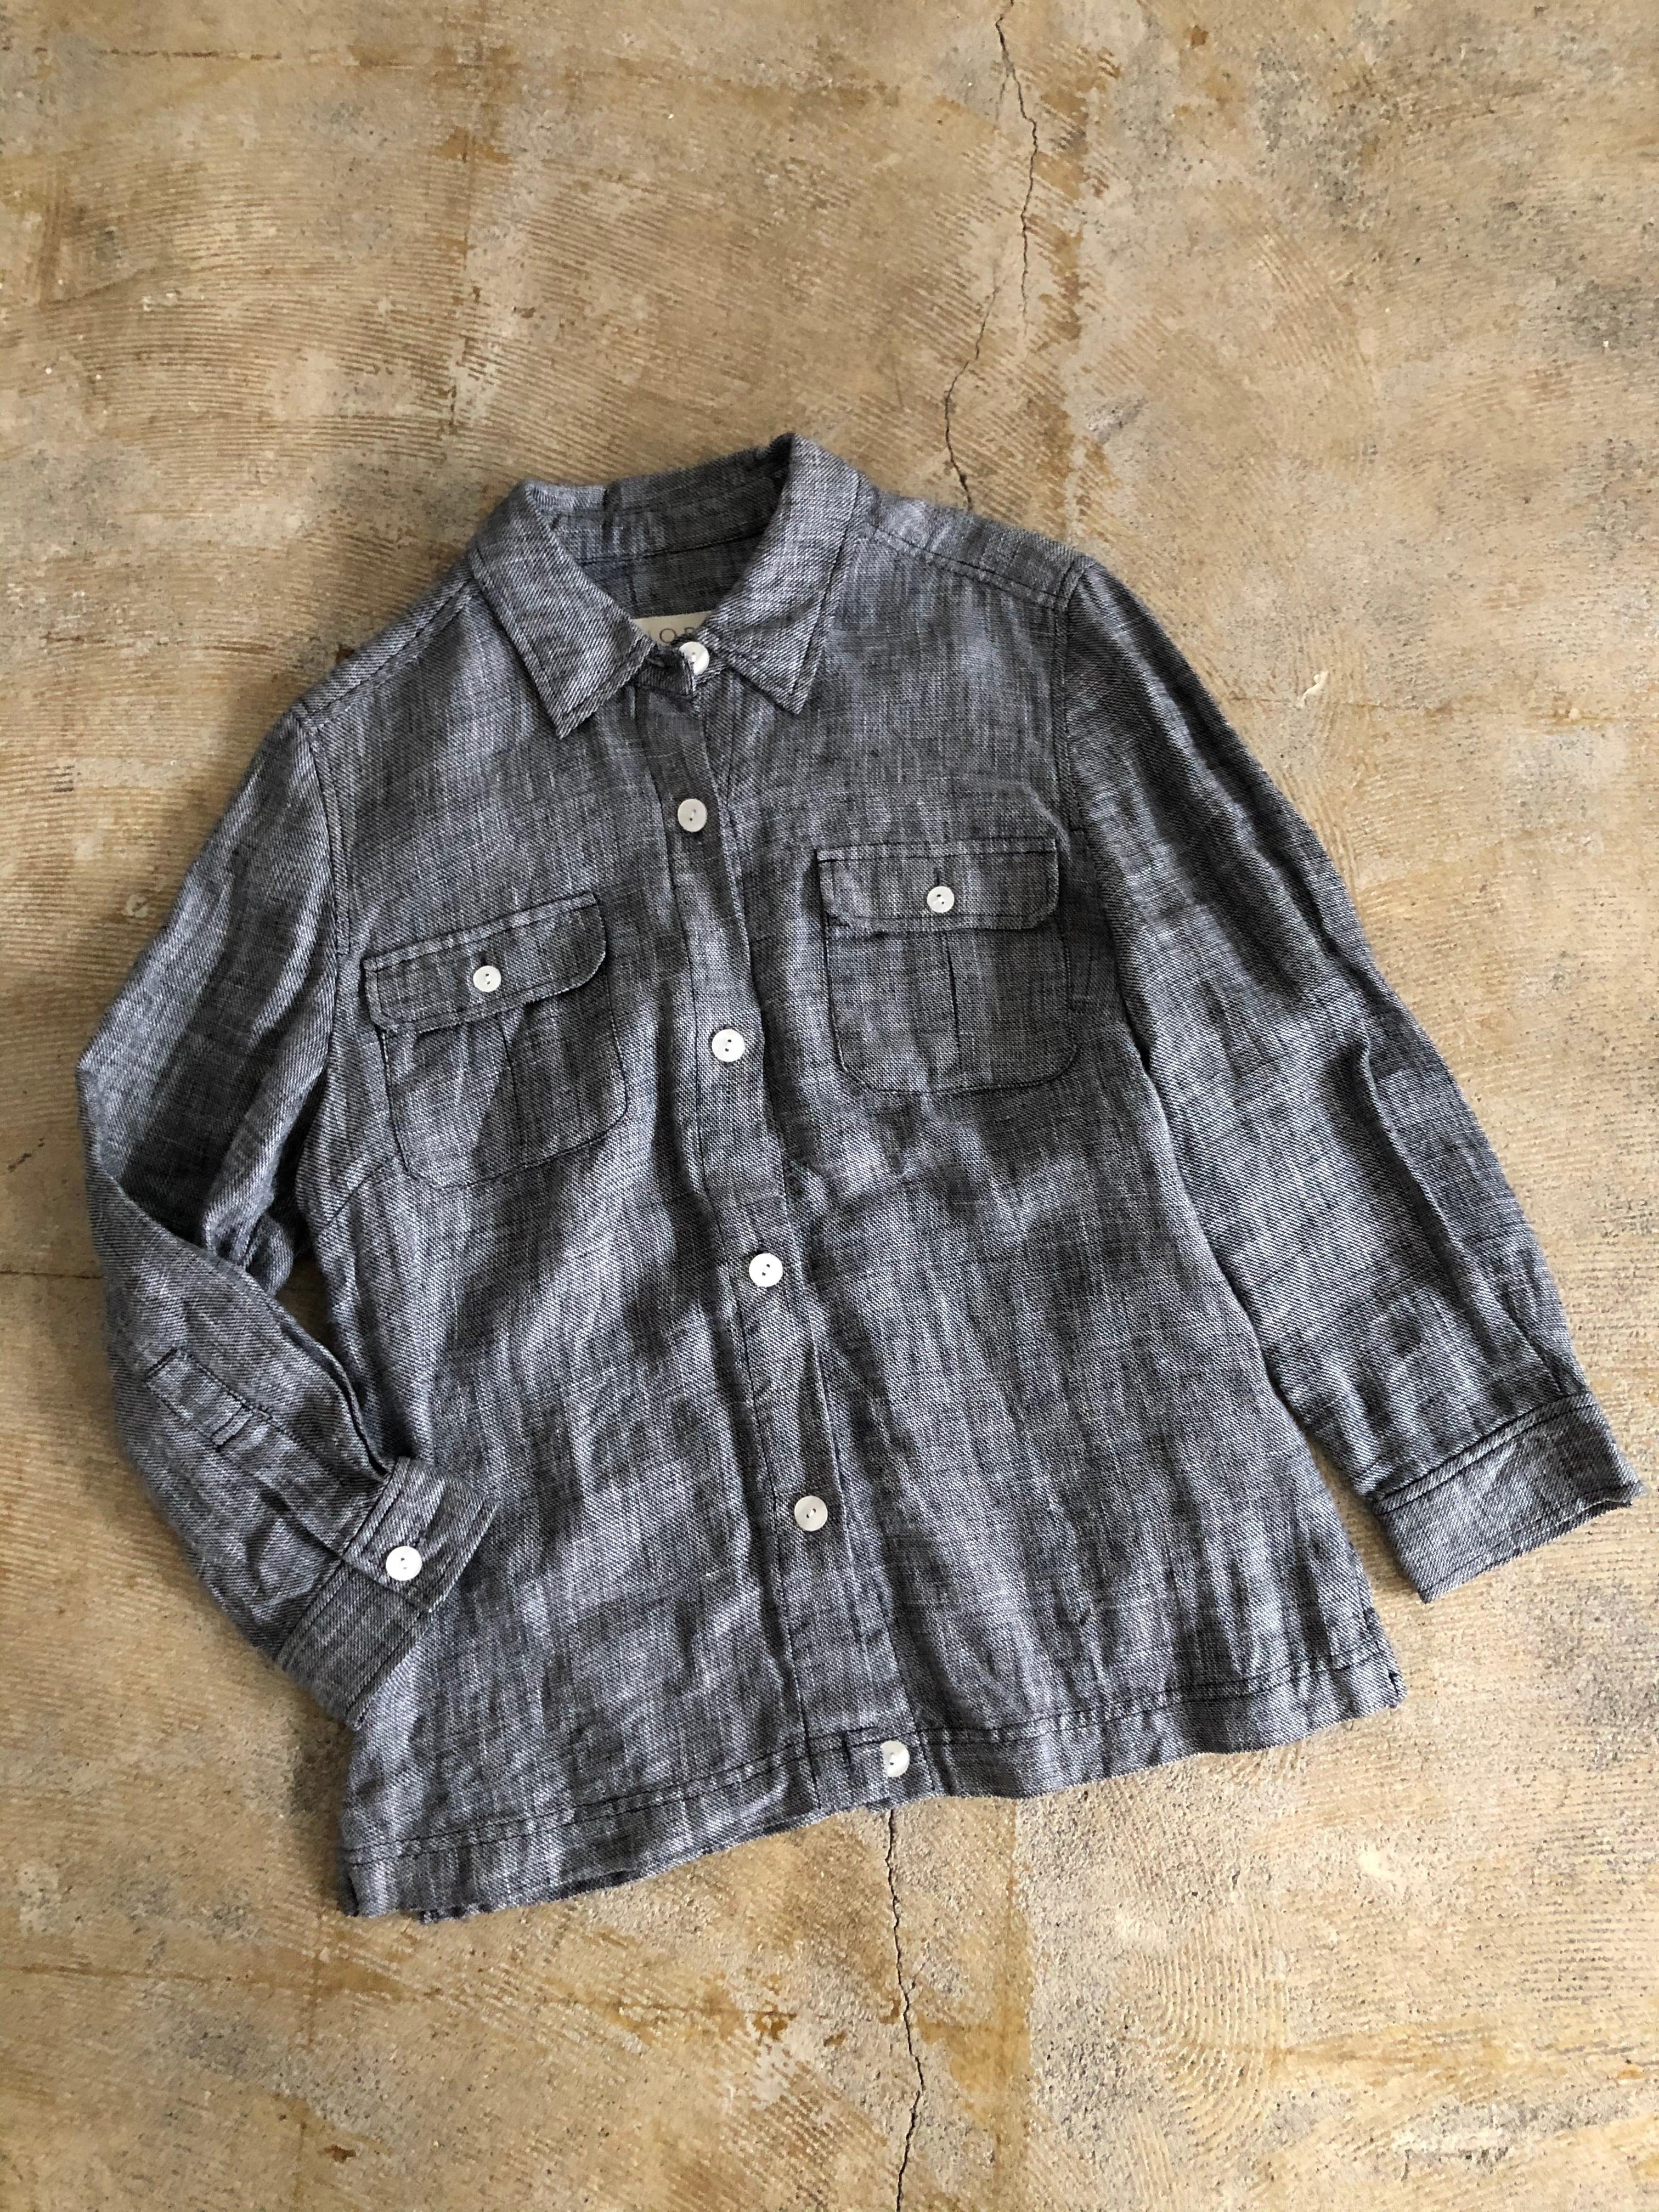 1990 NORTON linen shirt